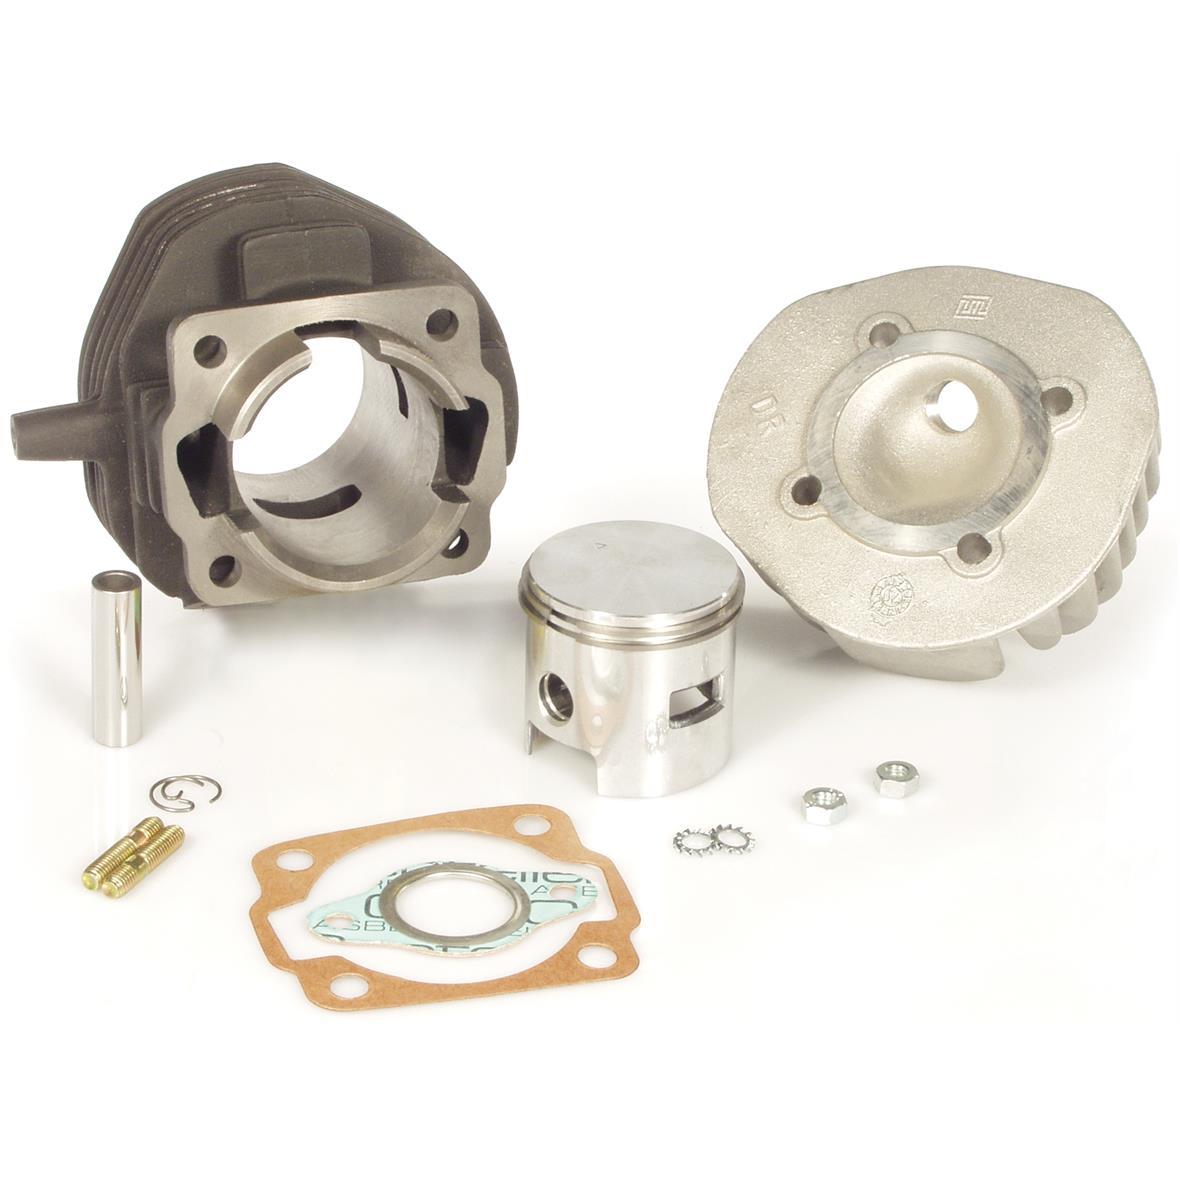 Productafbeelding voor 'Racing Cilinder D.R. by SIP 85 ccTitle'